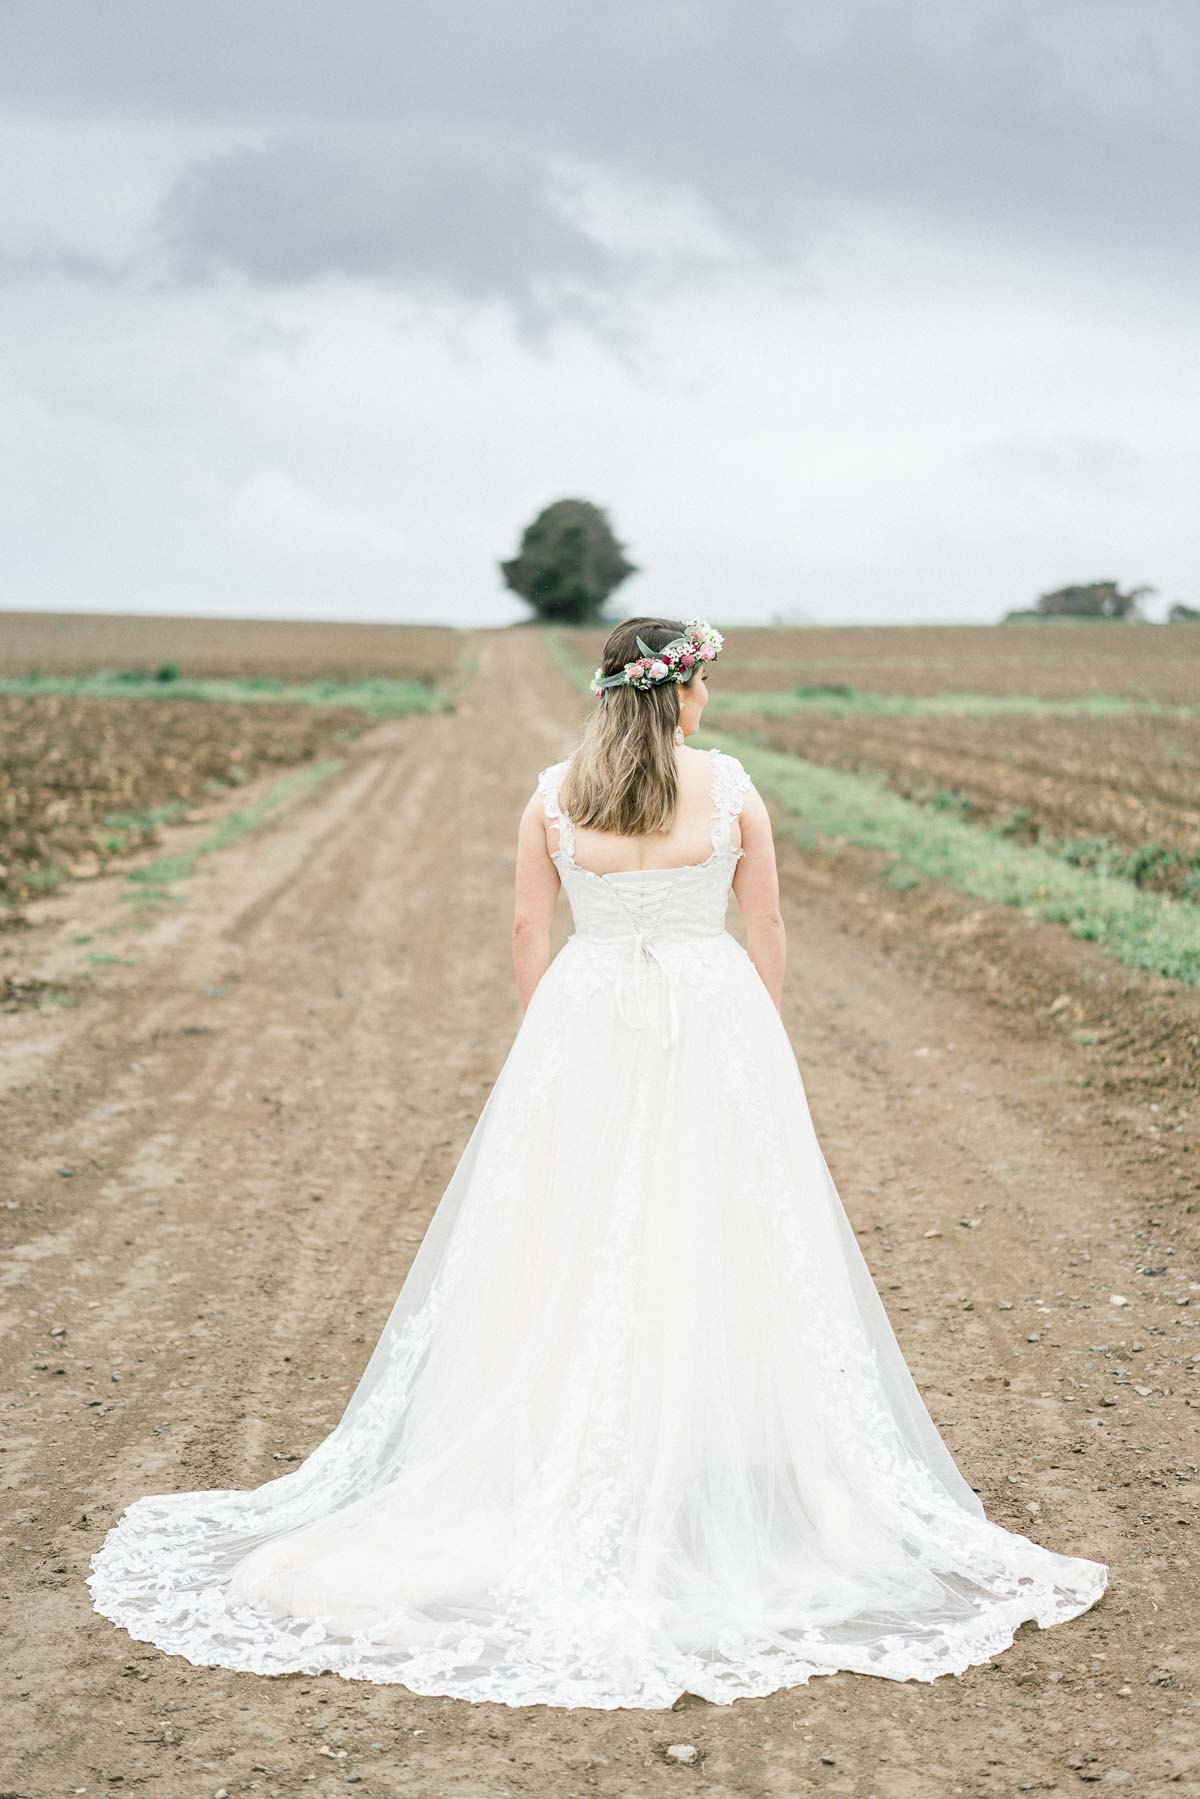 adams-farm-coldstream-yarra-valley-wedding-heart+soul-weddings-kel-jarryd-05504.jpg